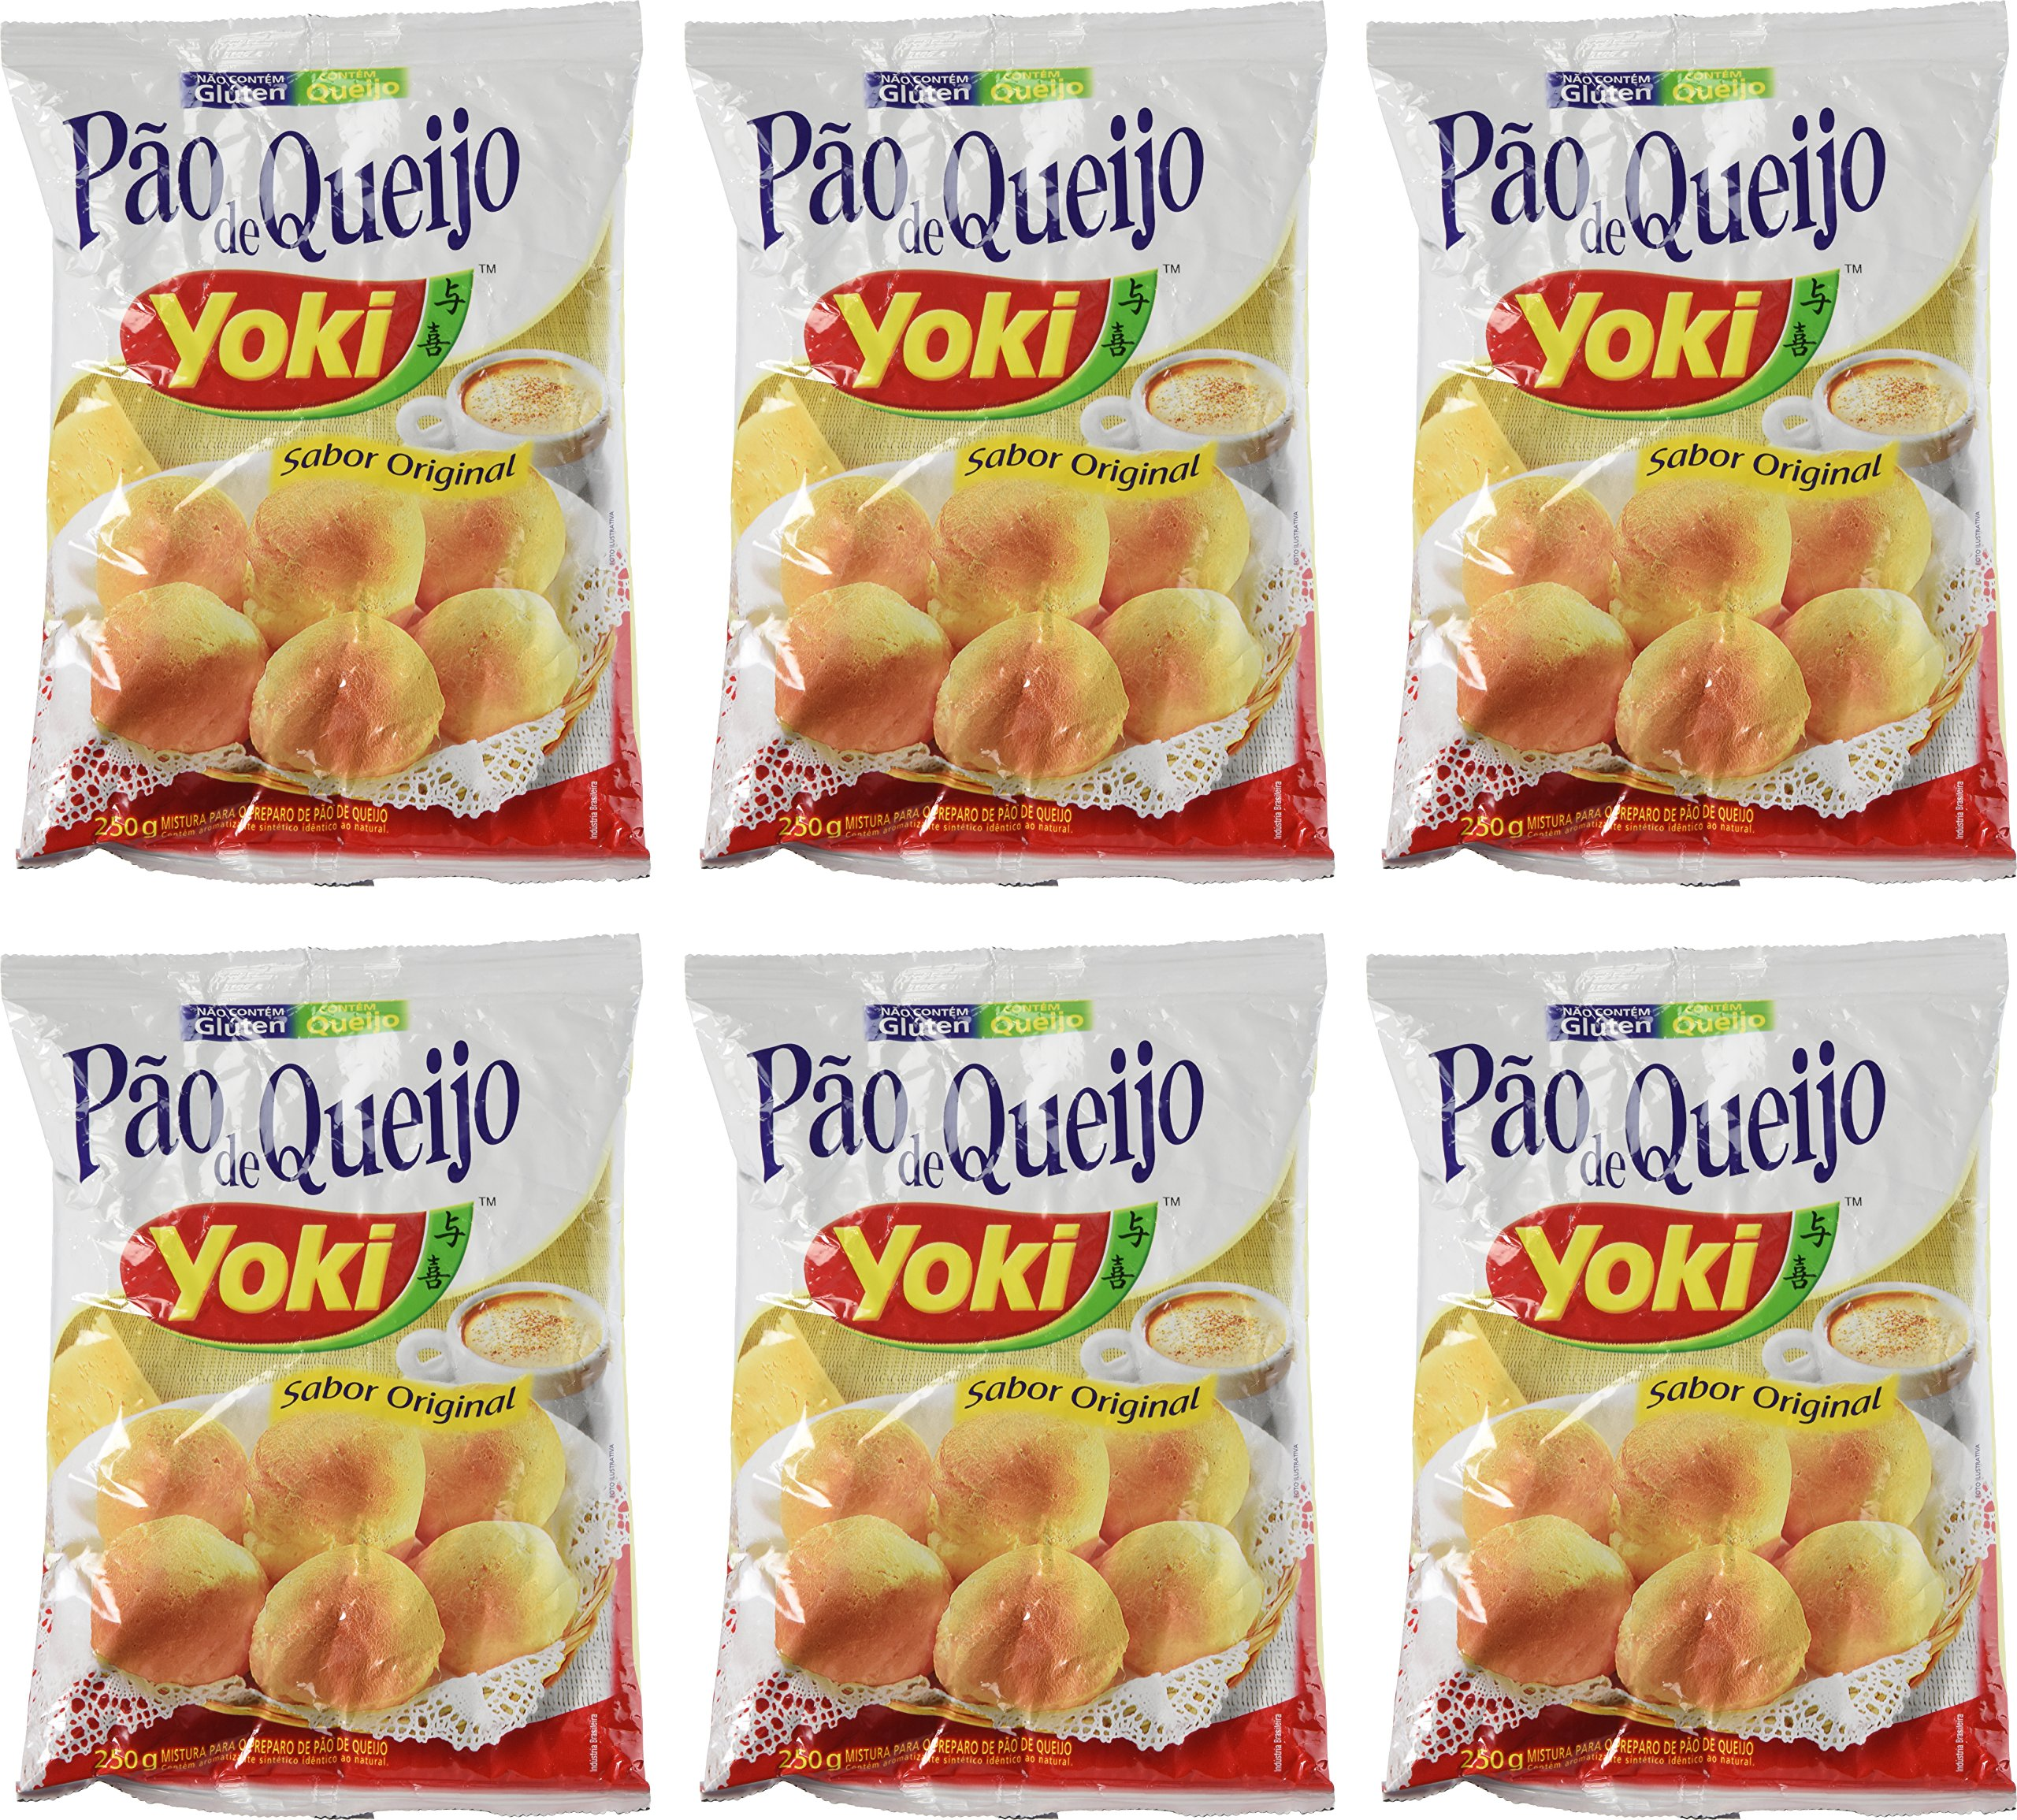 Cheese Bread Mix - Mistura para Pão de Queijo - Yoki - 8.80 oz (250g) - GLUTEN-FREE - (PACK OF 06) by Yoki (Image #1)